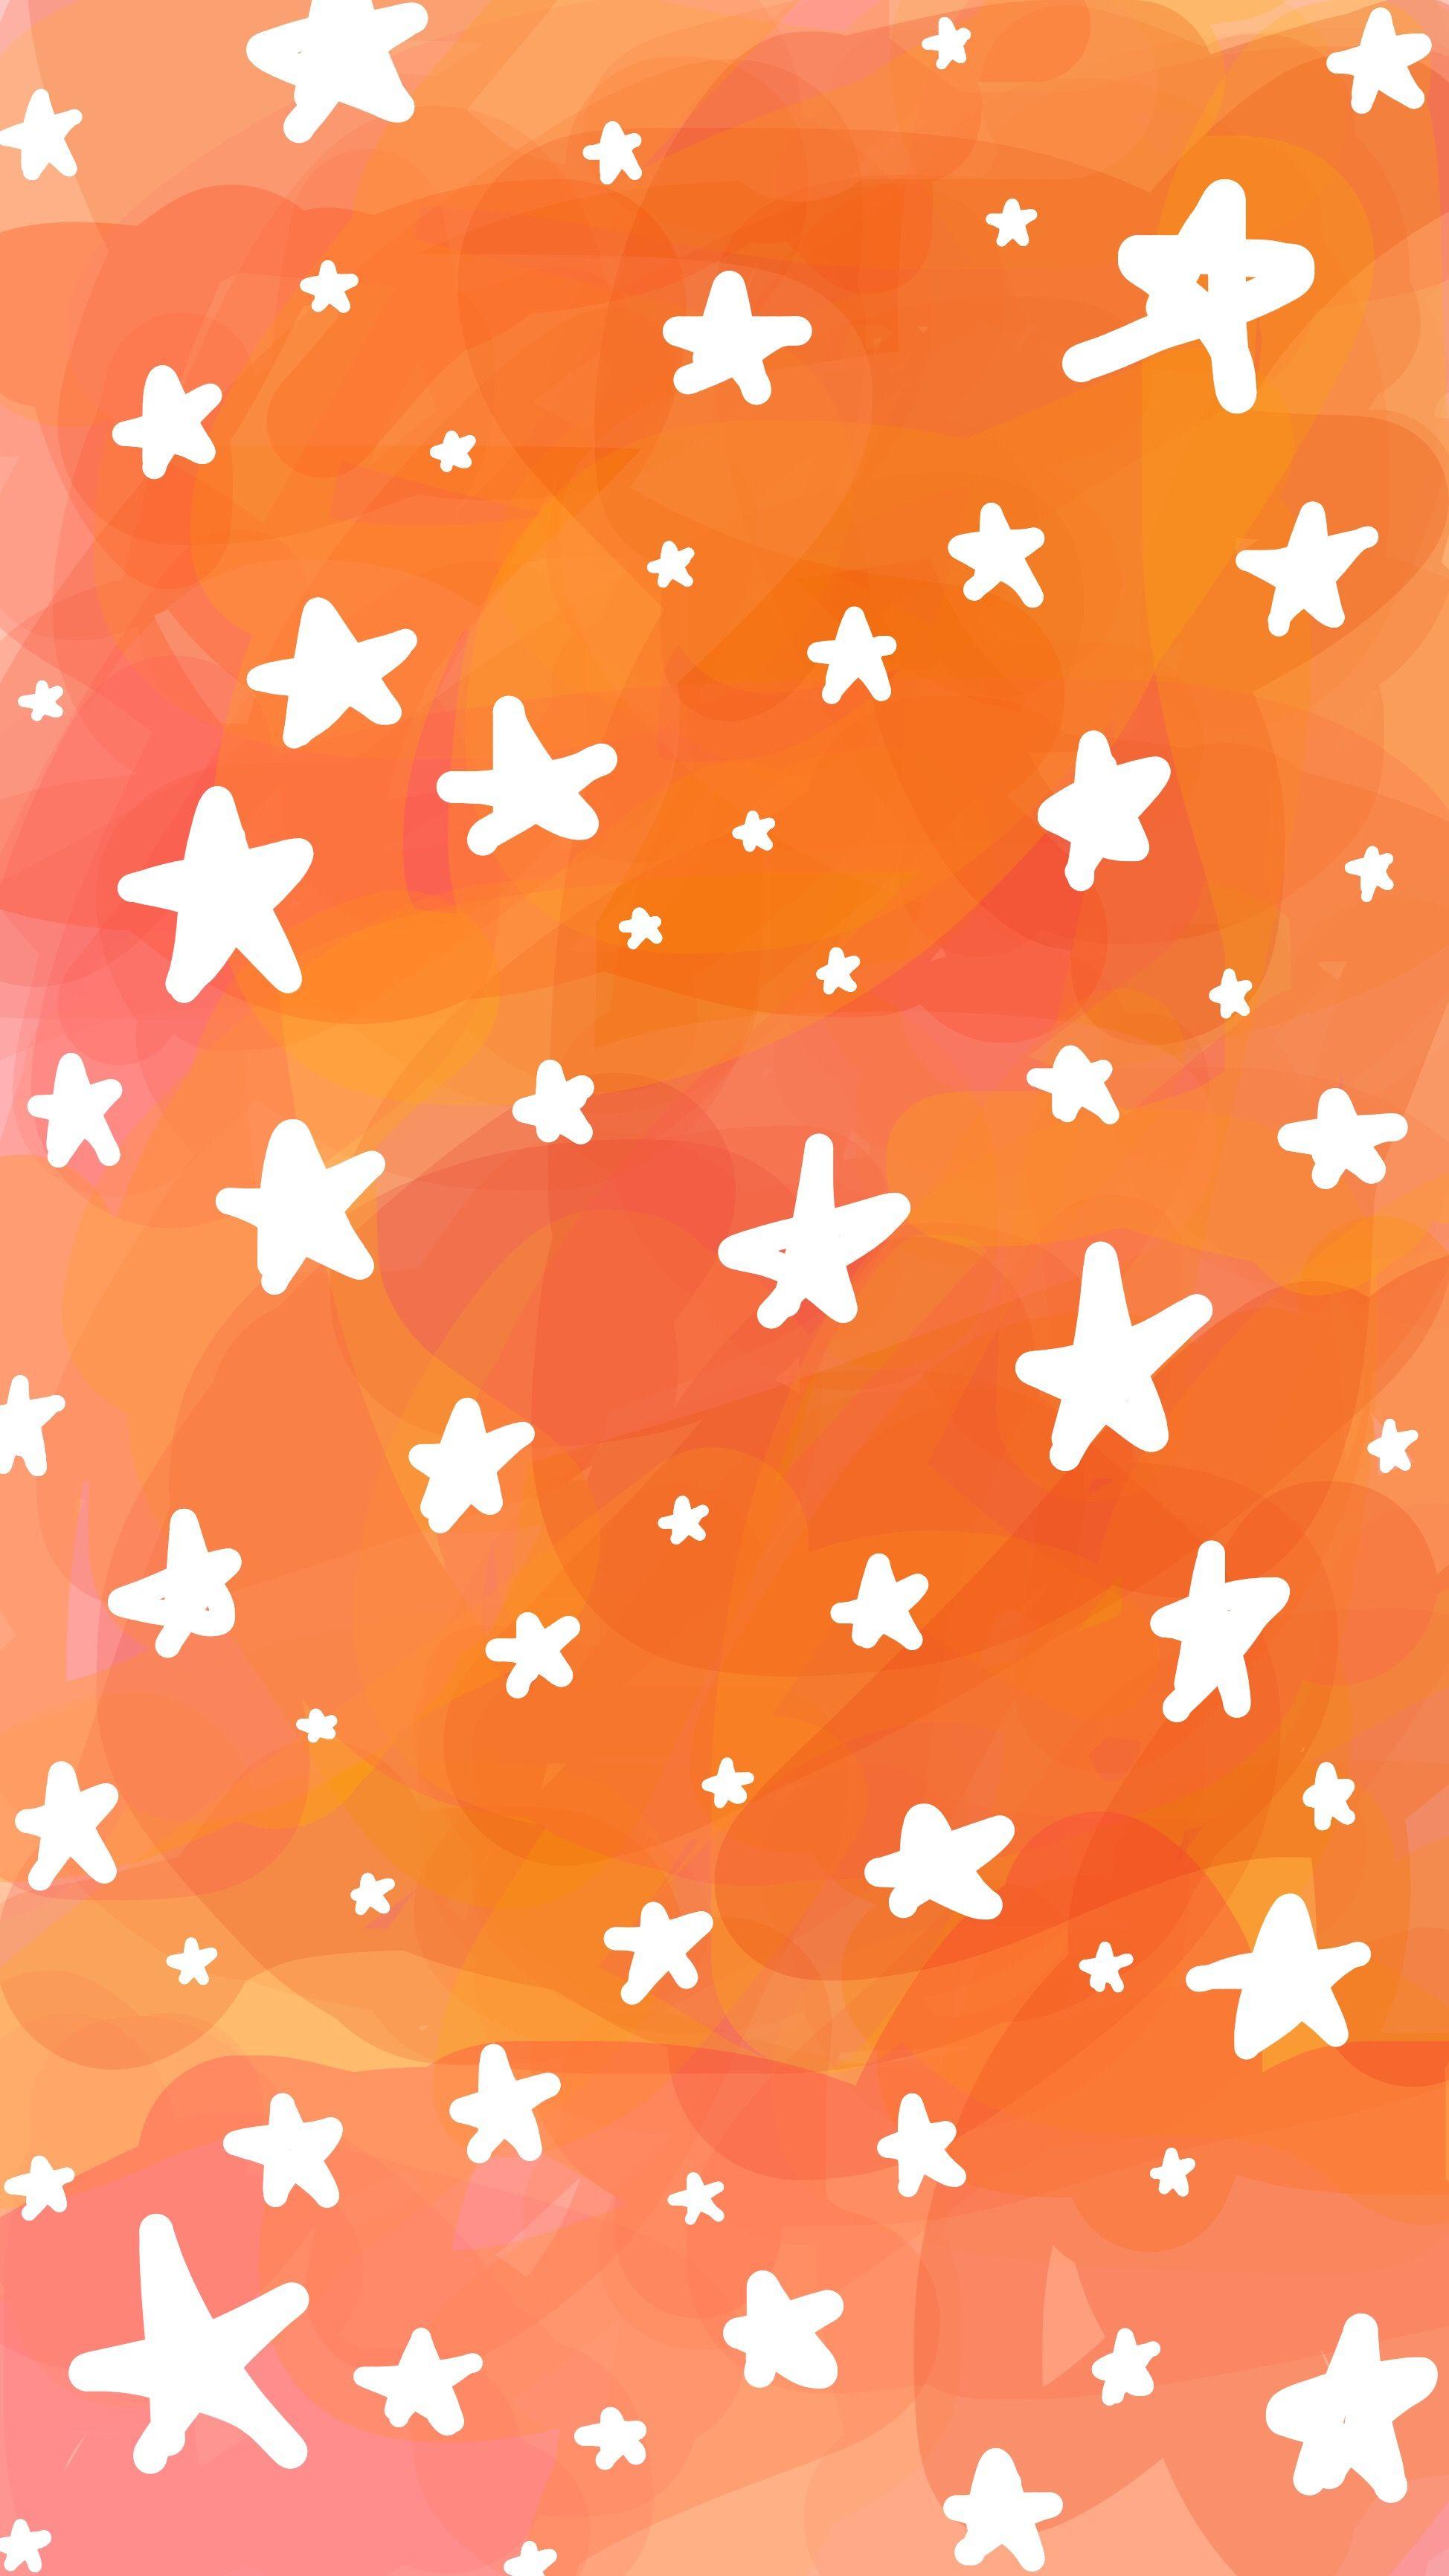 Phone Background Orange Wallpaper Iphone Background Wallpaper Cute Patterns Wallpaper